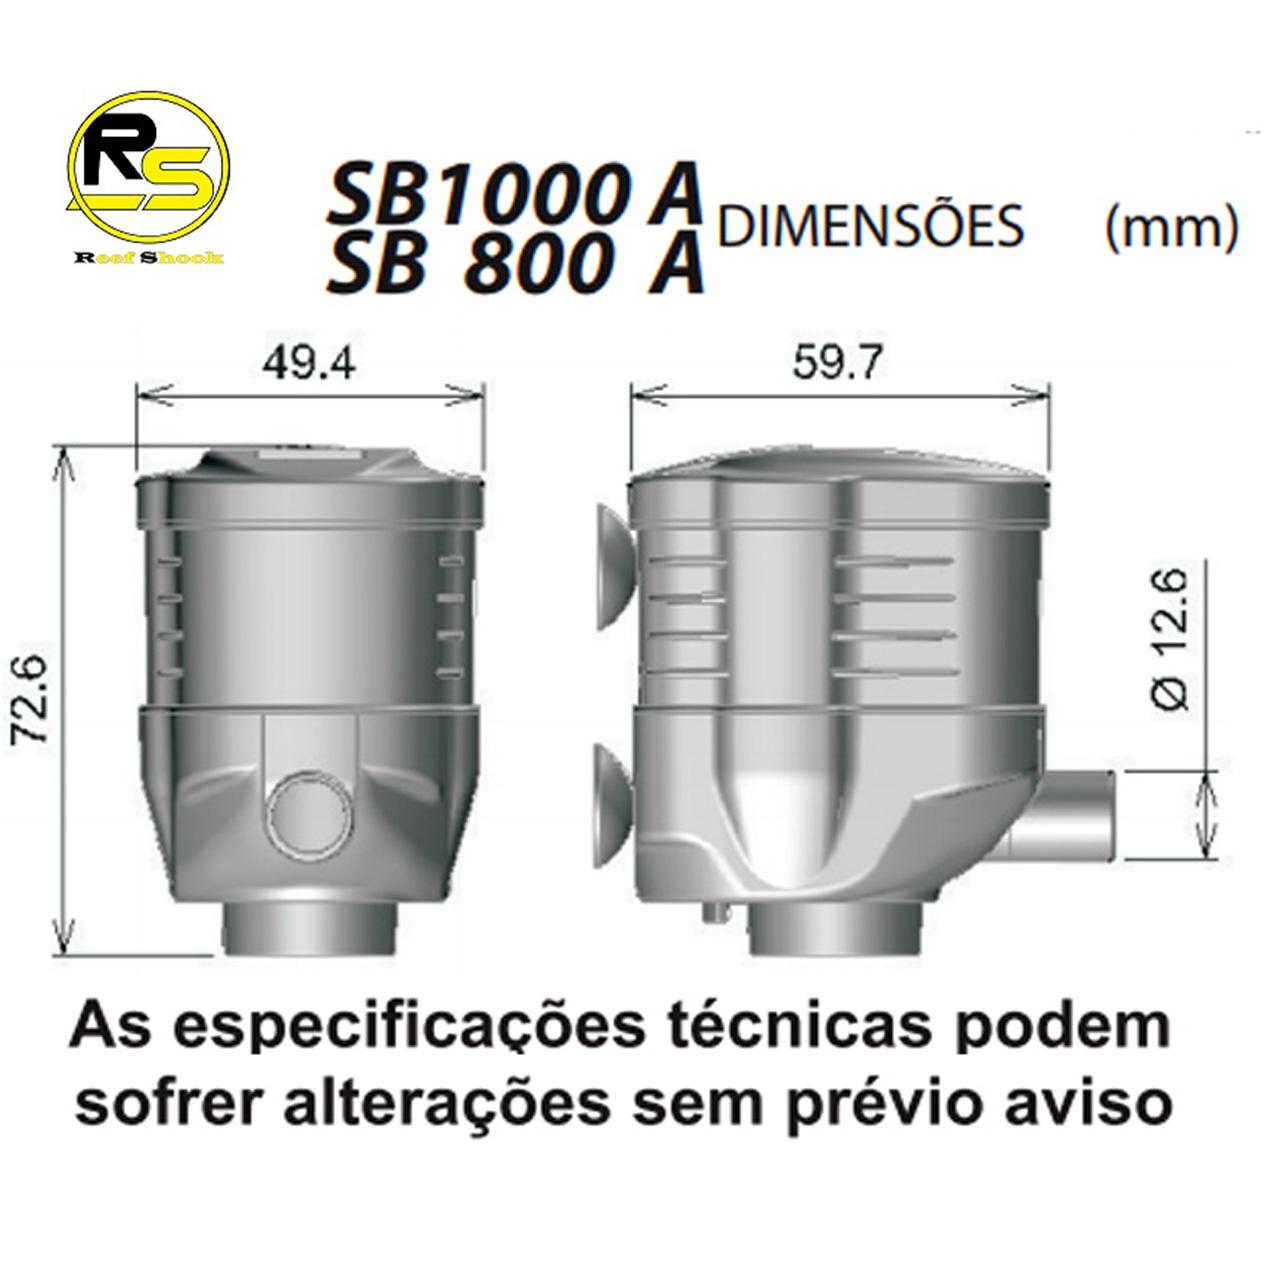 Bomba Submersa Sarlo Better 1000a 1000 L/h Sb1000a 110v ou 220v